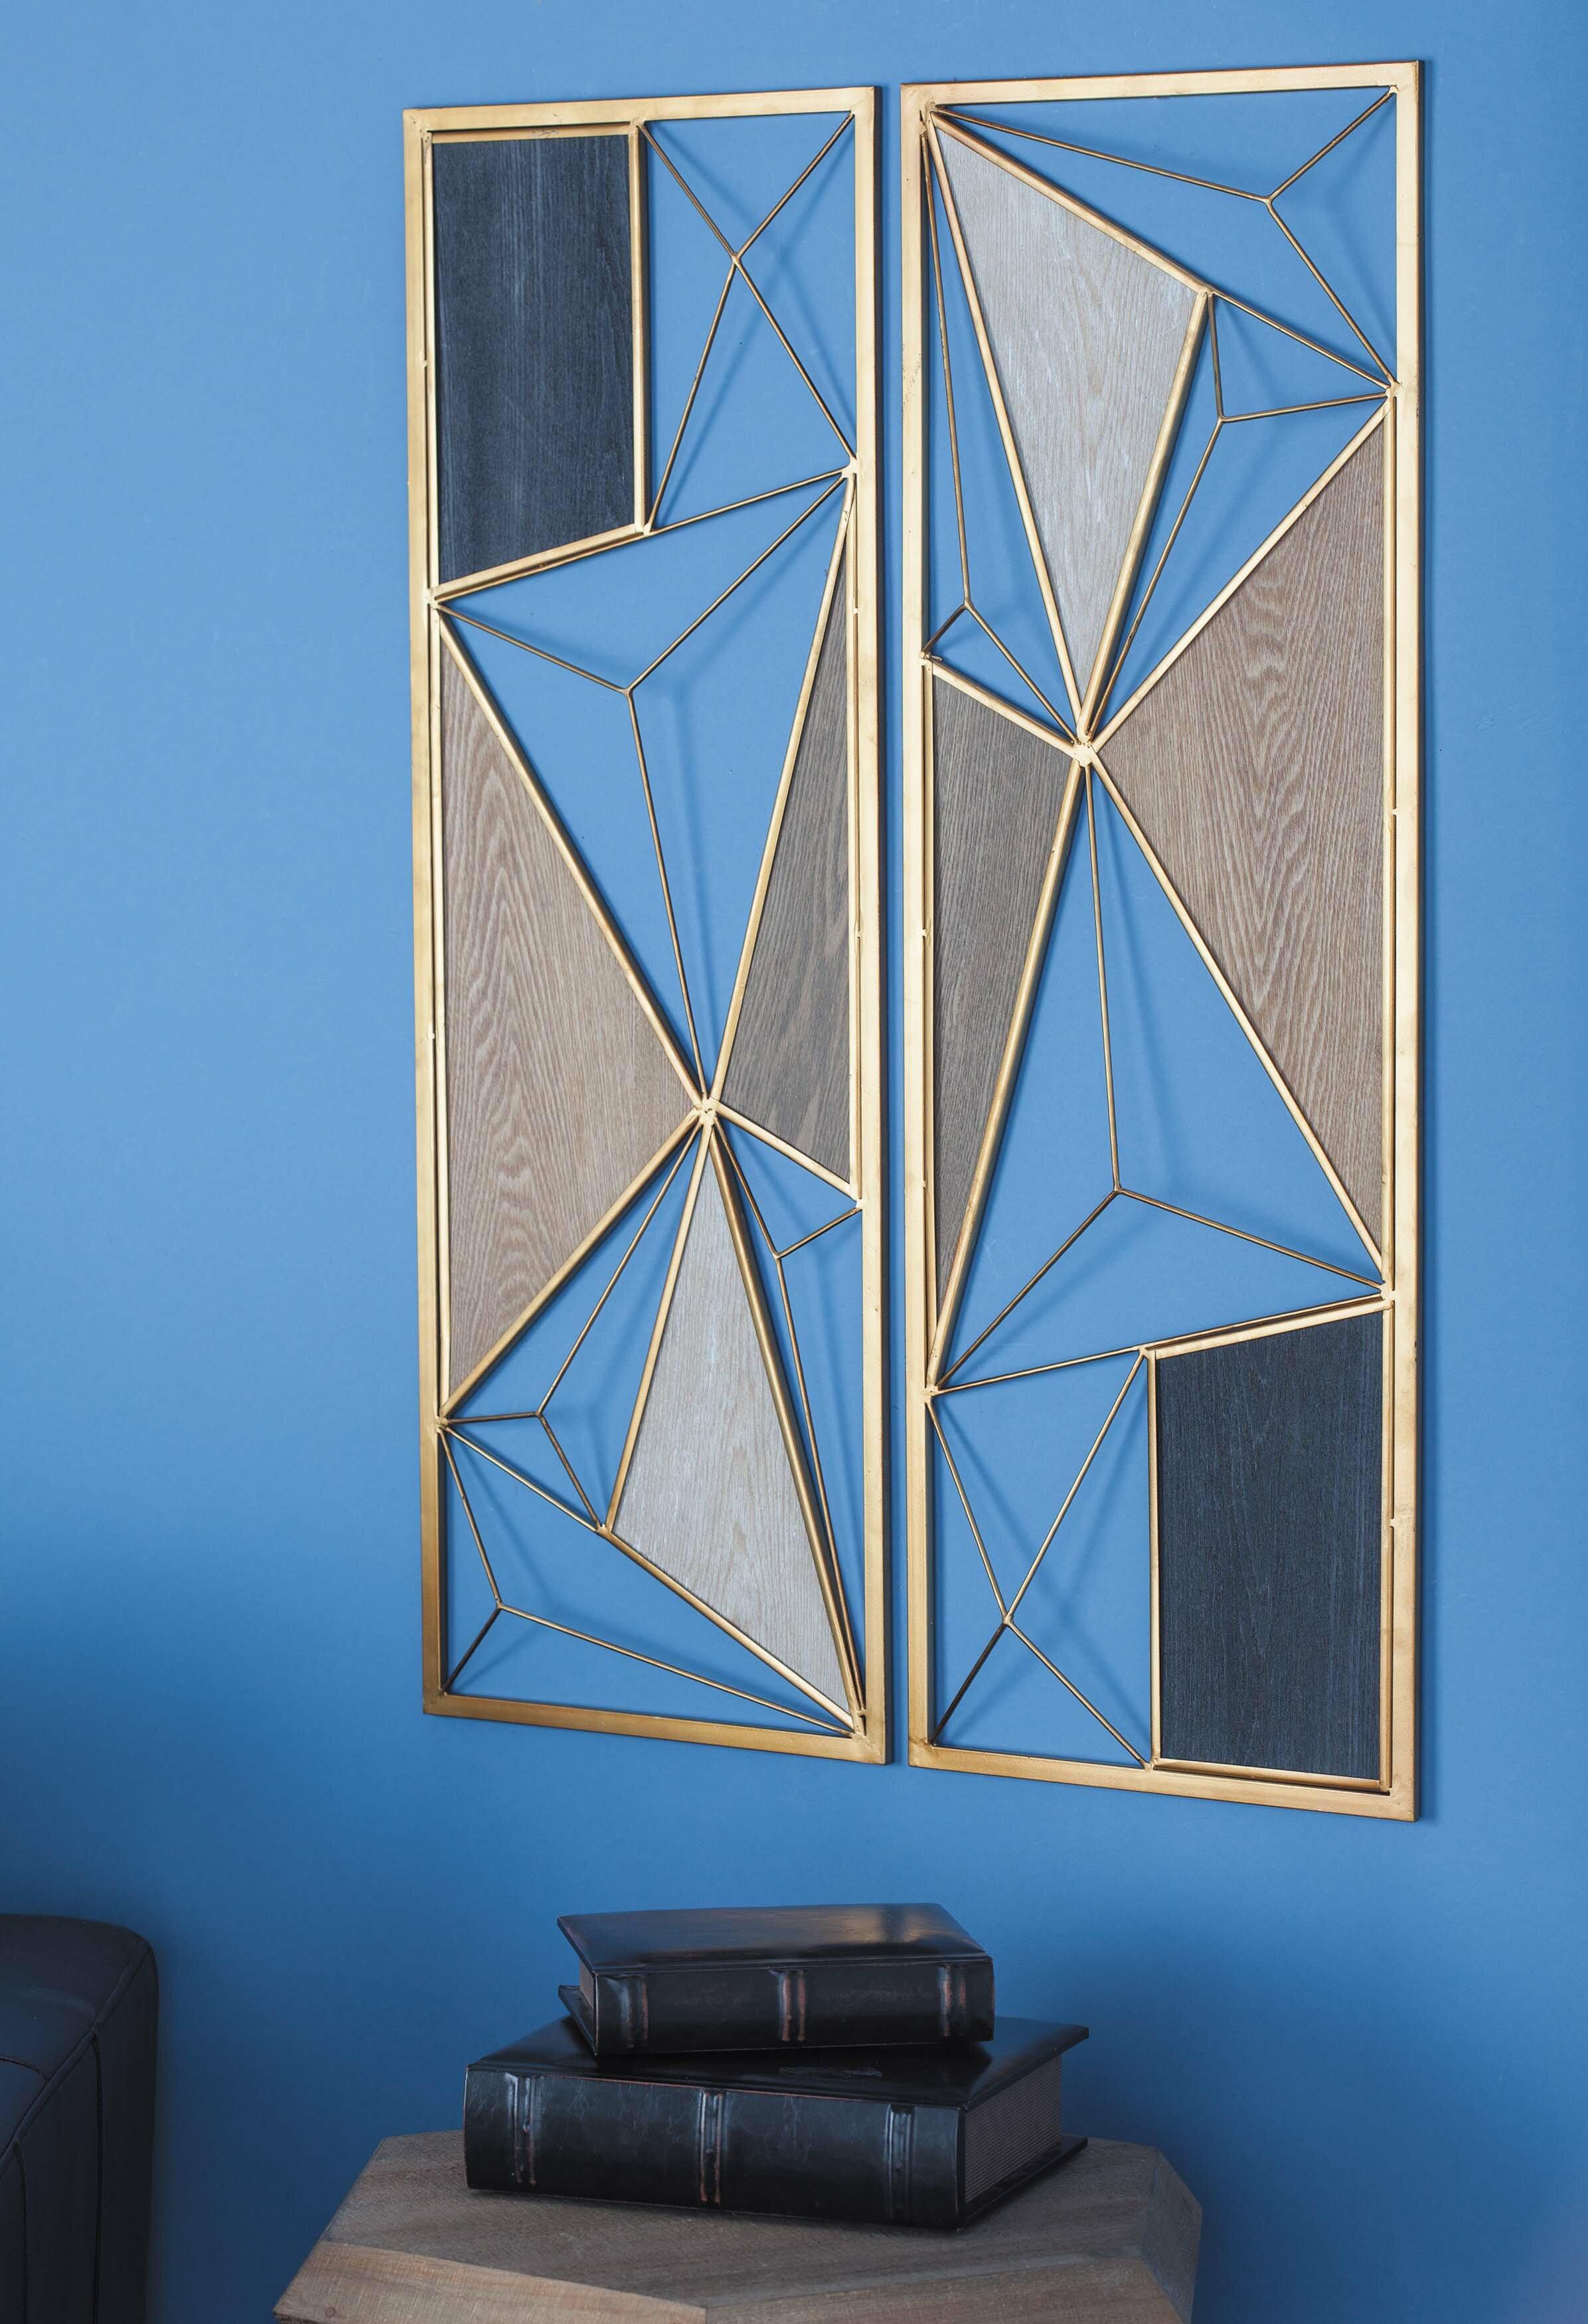 Cosmoliving By Cosmopolitan 2 Piece Metal Wood Wall Decor Set Reviews Wayfair